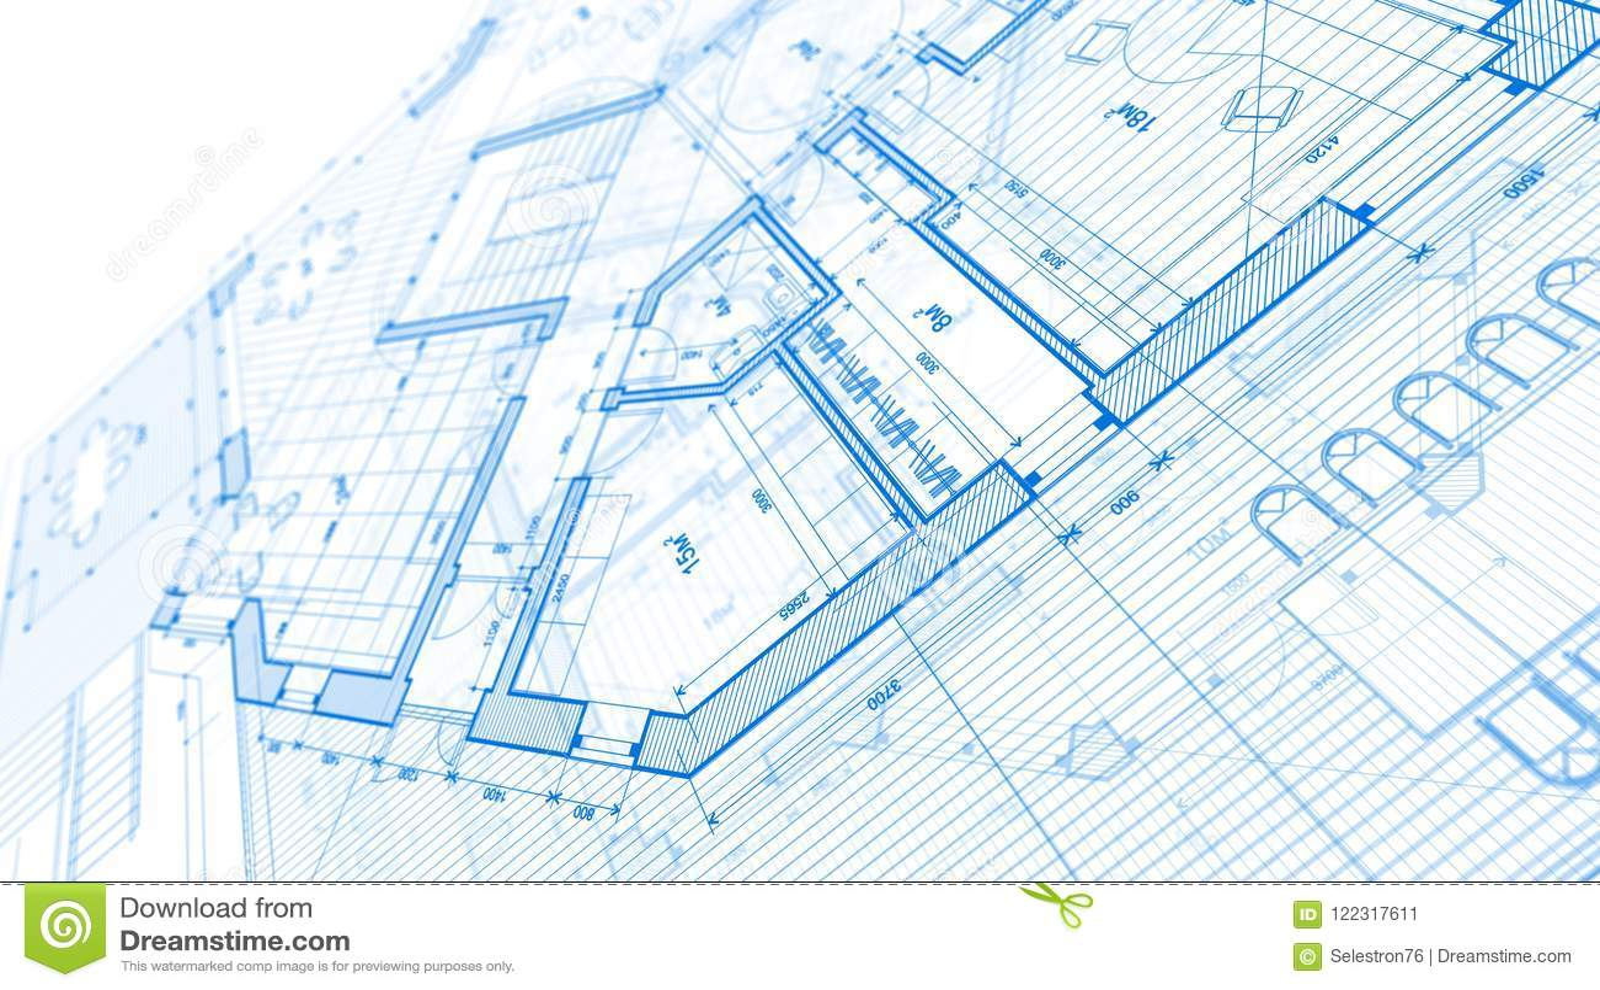 Architecture design blueprint plan illustration of a plan mod architecture design blueprint plan illustration of a plan mod malvernweather Gallery